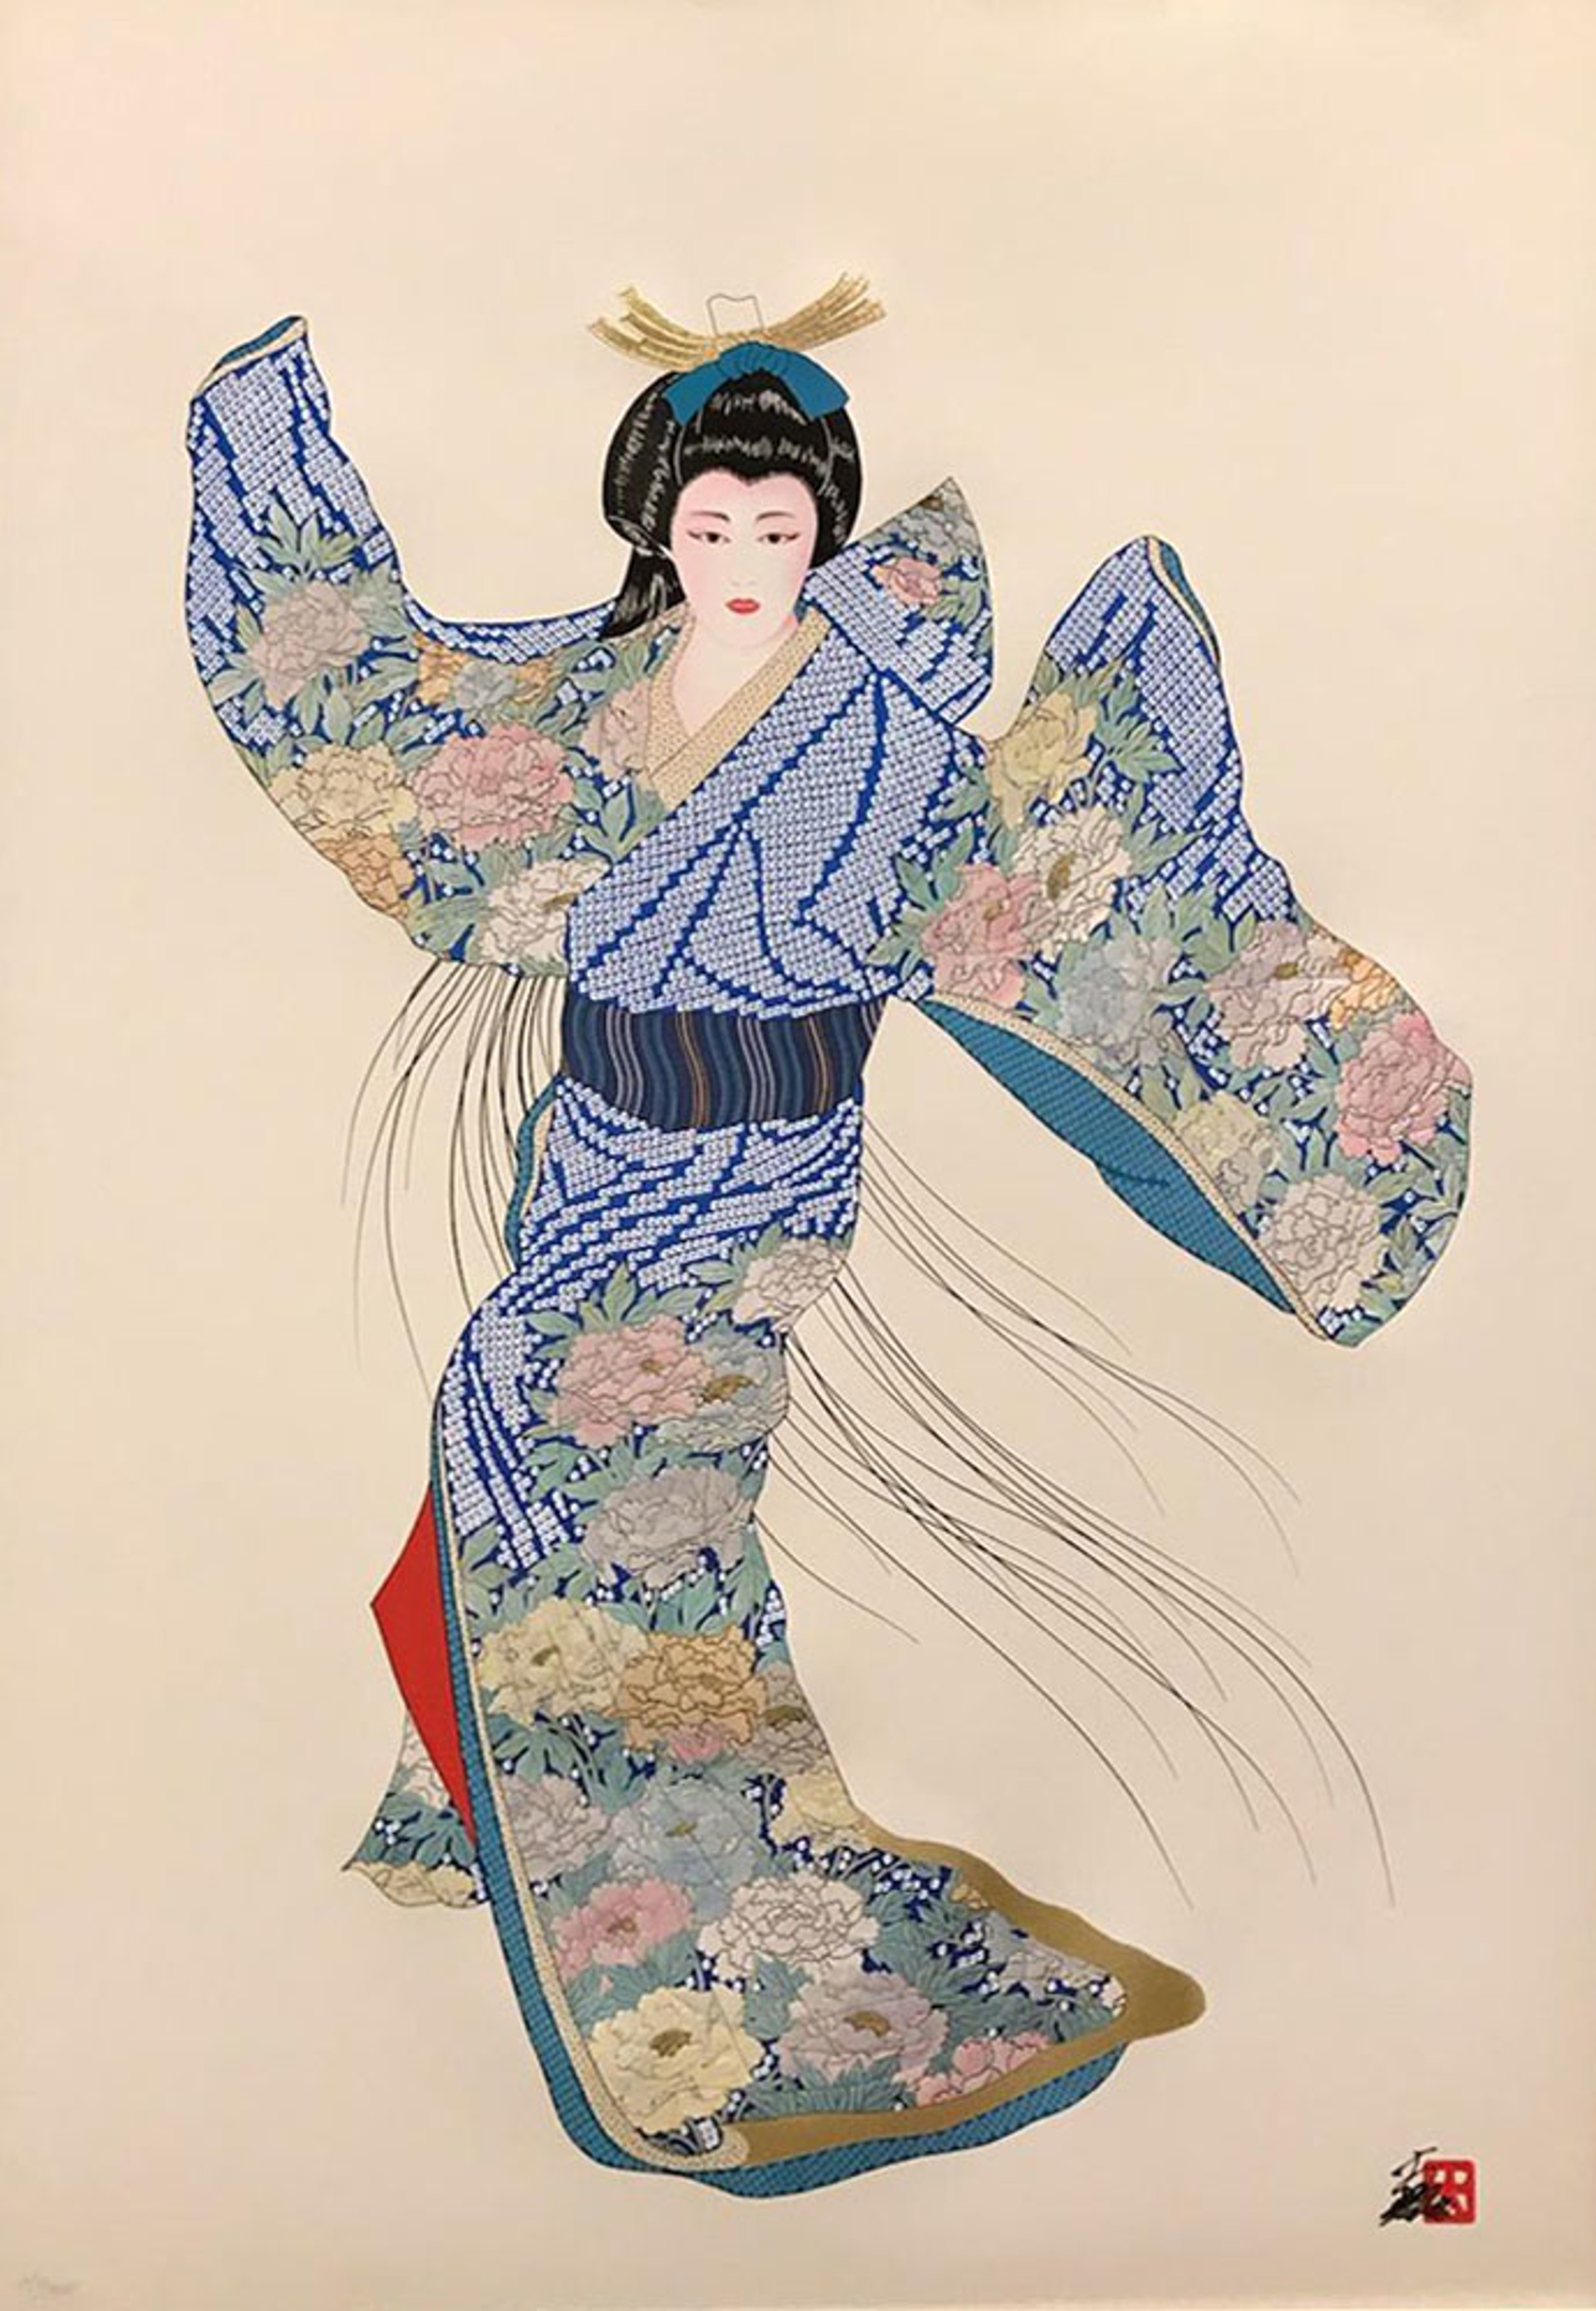 Lady Mieko Summer II* by Hisashi Otsuka